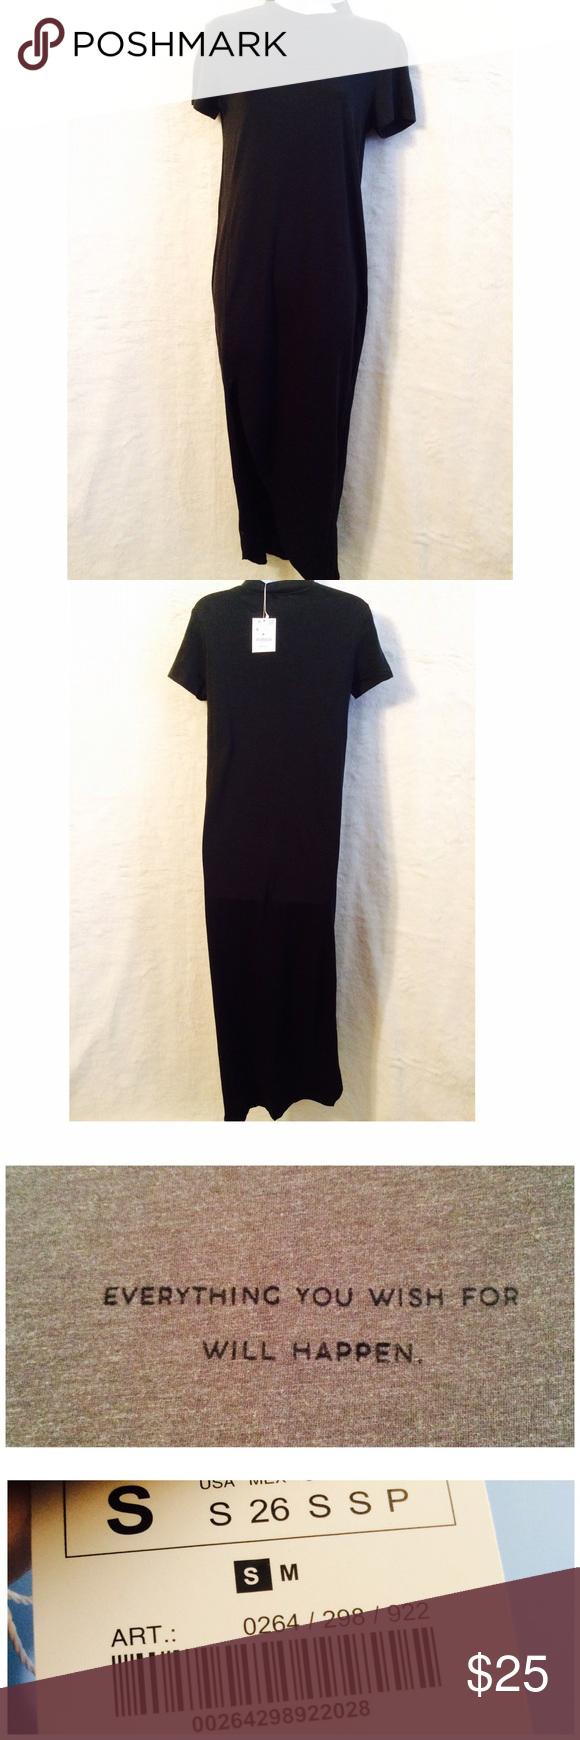 Zara black t shirt dress zara black zara dresses and maxi dresses